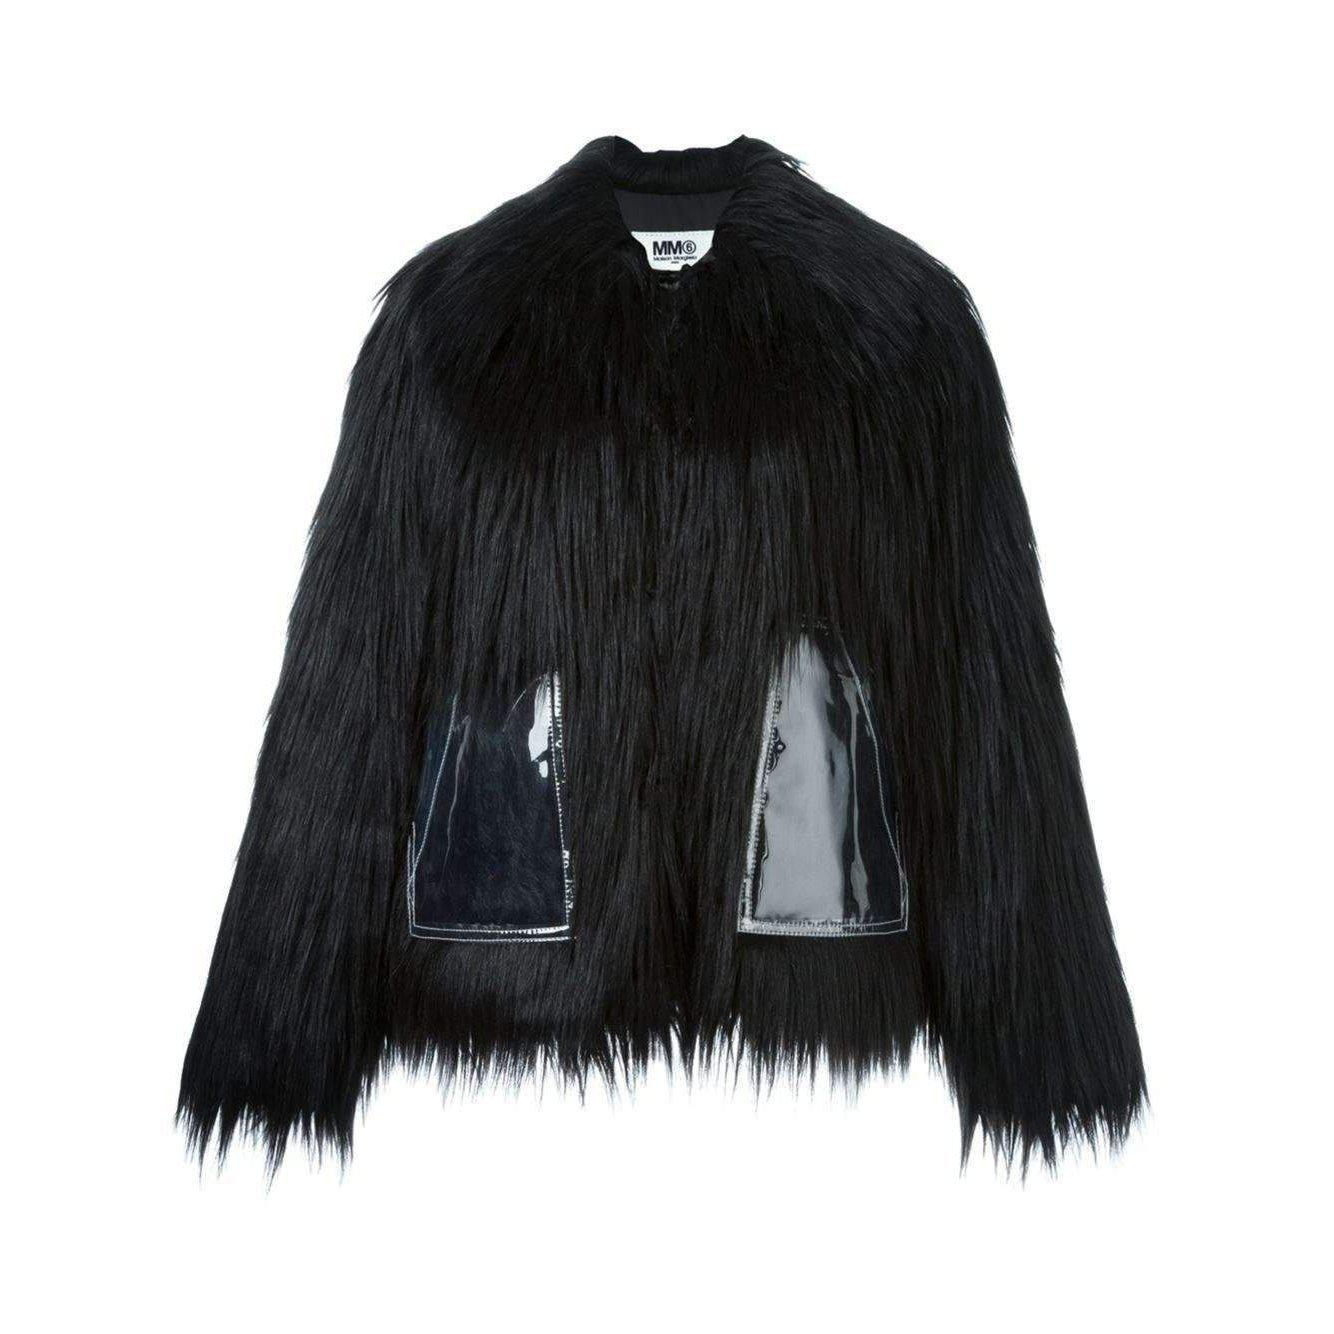 Lyst - MM6 by Maison Martin Margiela Black Faux Fur Jacket in Black 4cc6c65c3f305